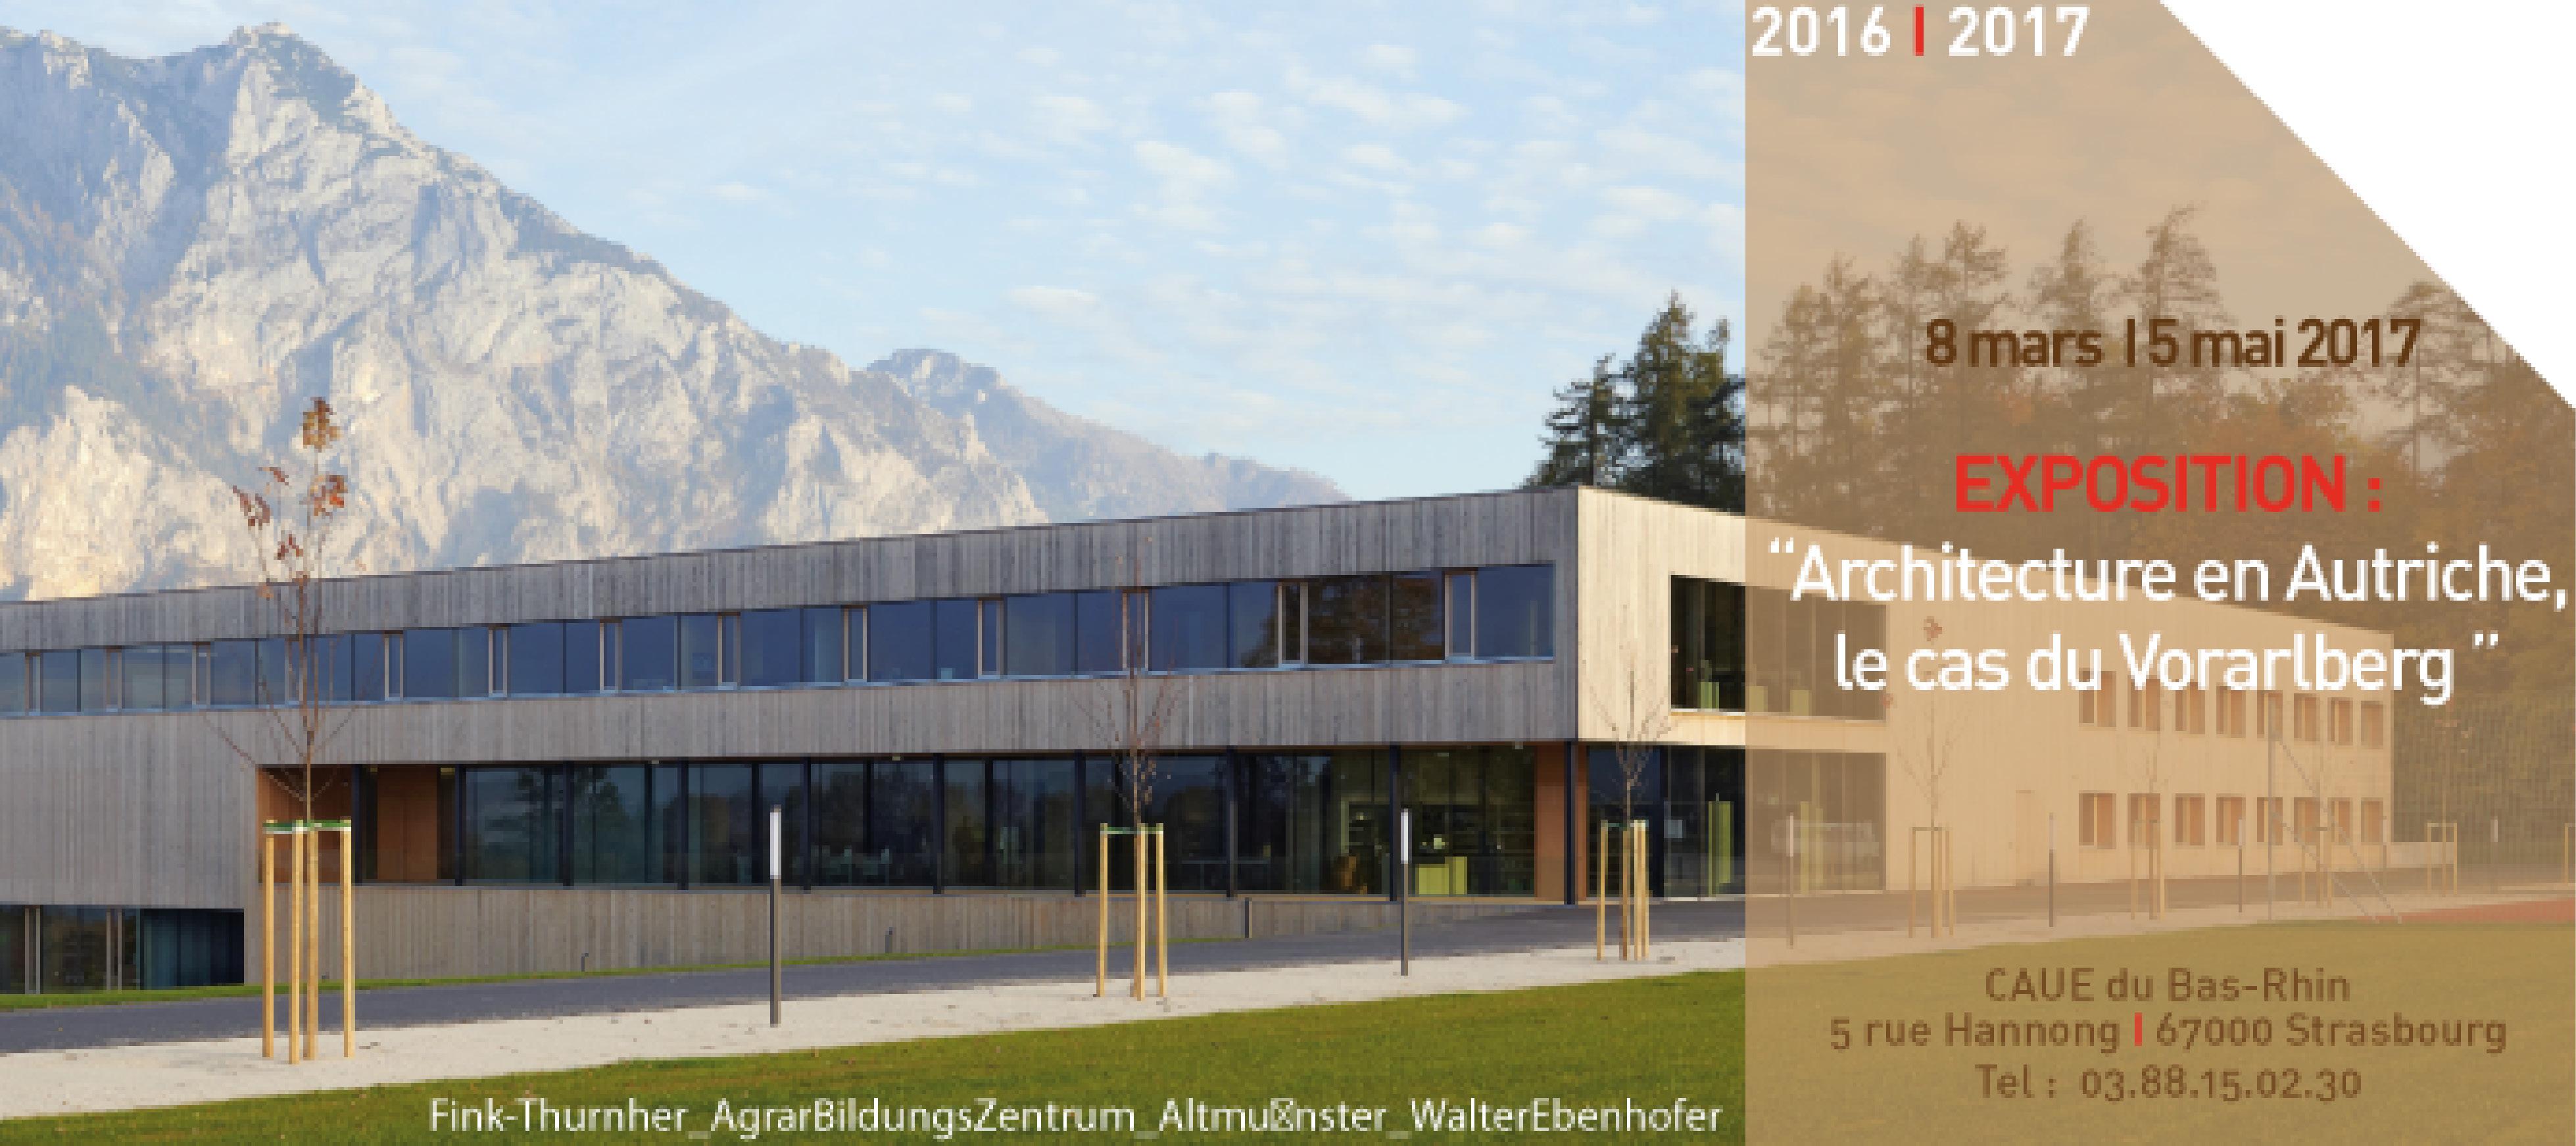 Architecte Bas Rhin l'architecture si particulière du vorarlberg - caue